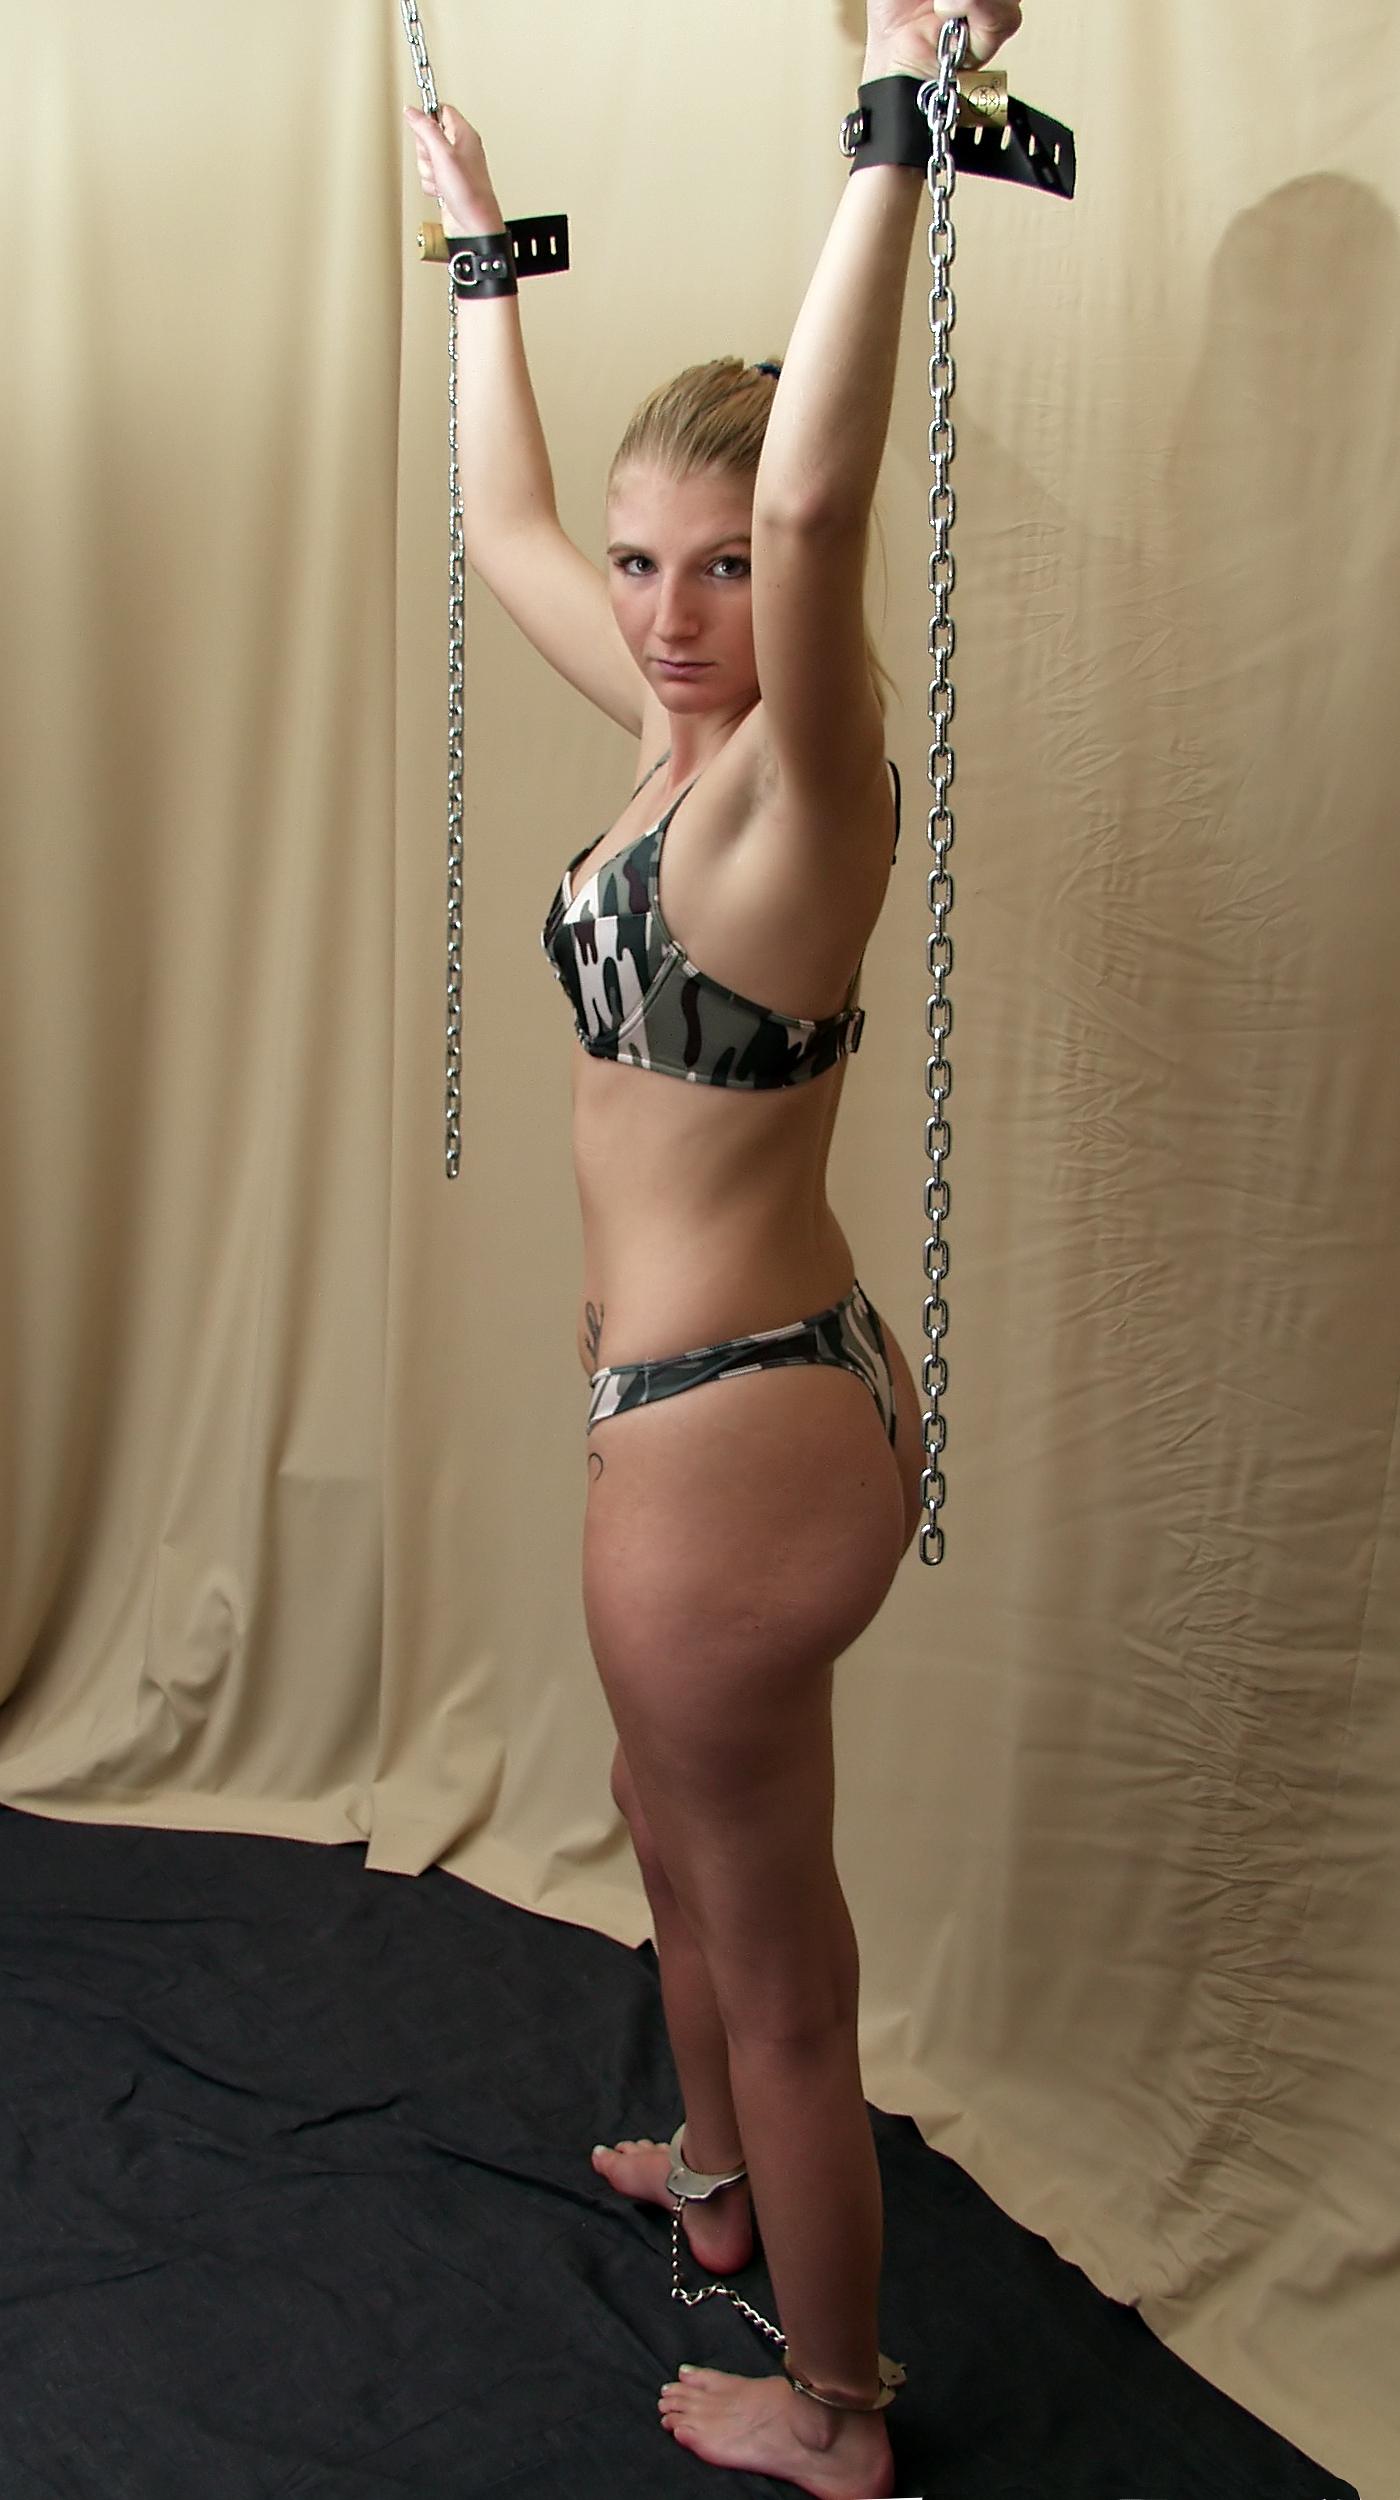 Hairy russian nude girl thumbs